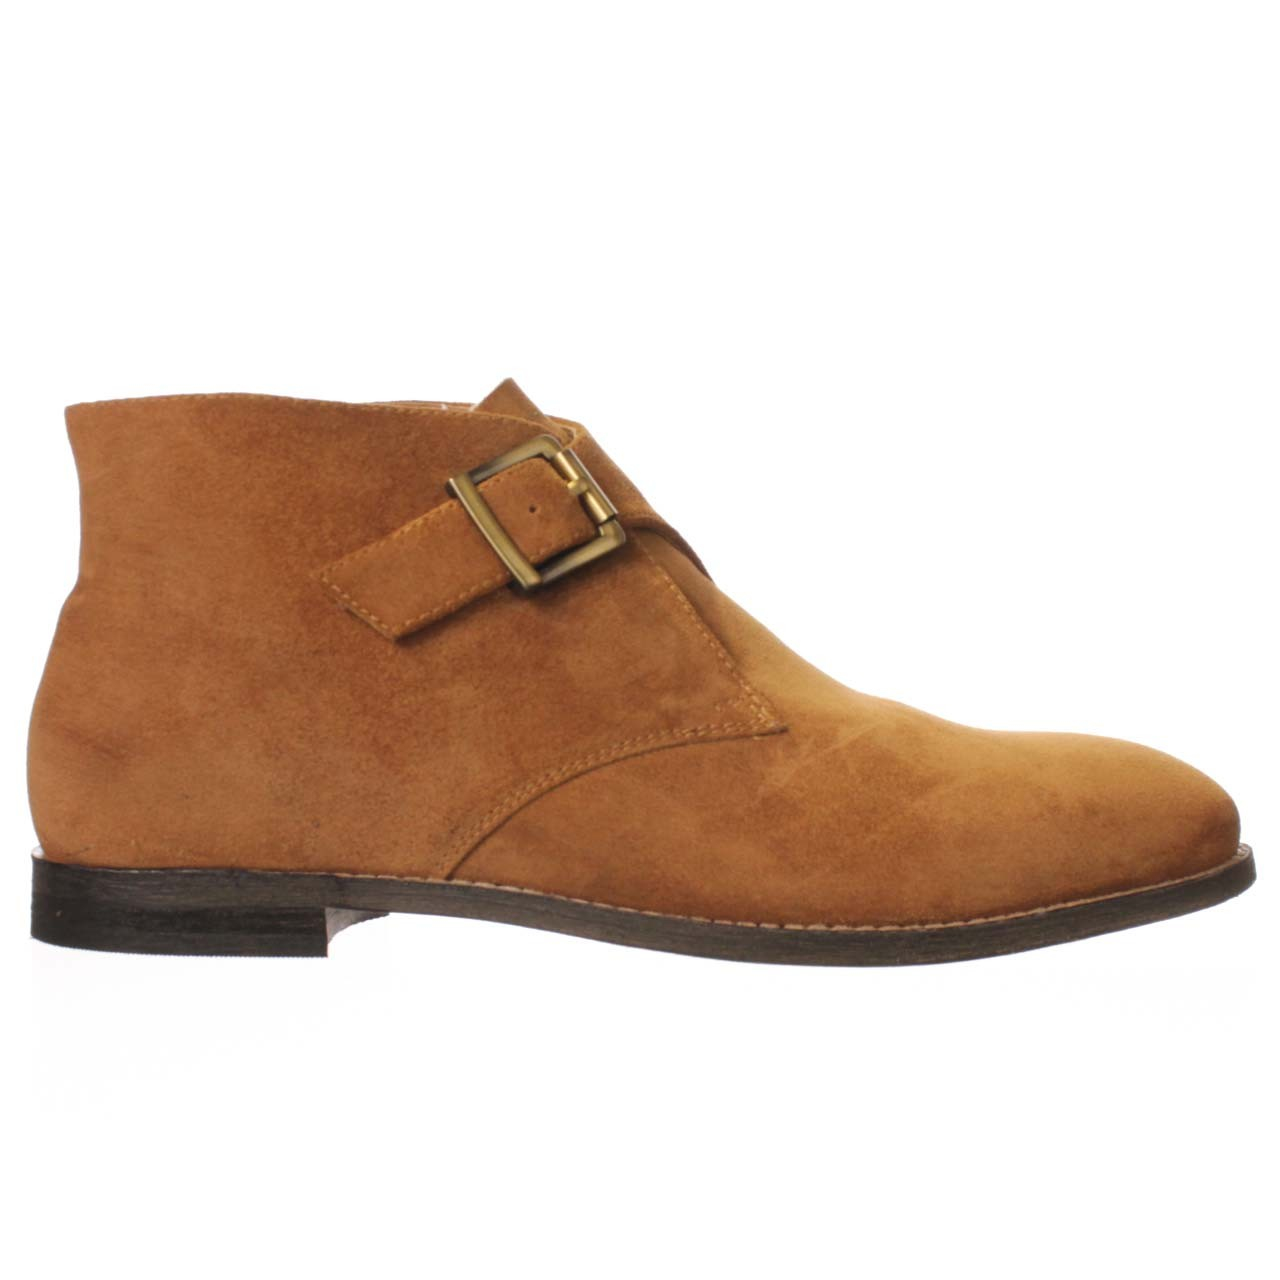 johnston murphy bellemonk ankle boot in brown lyst